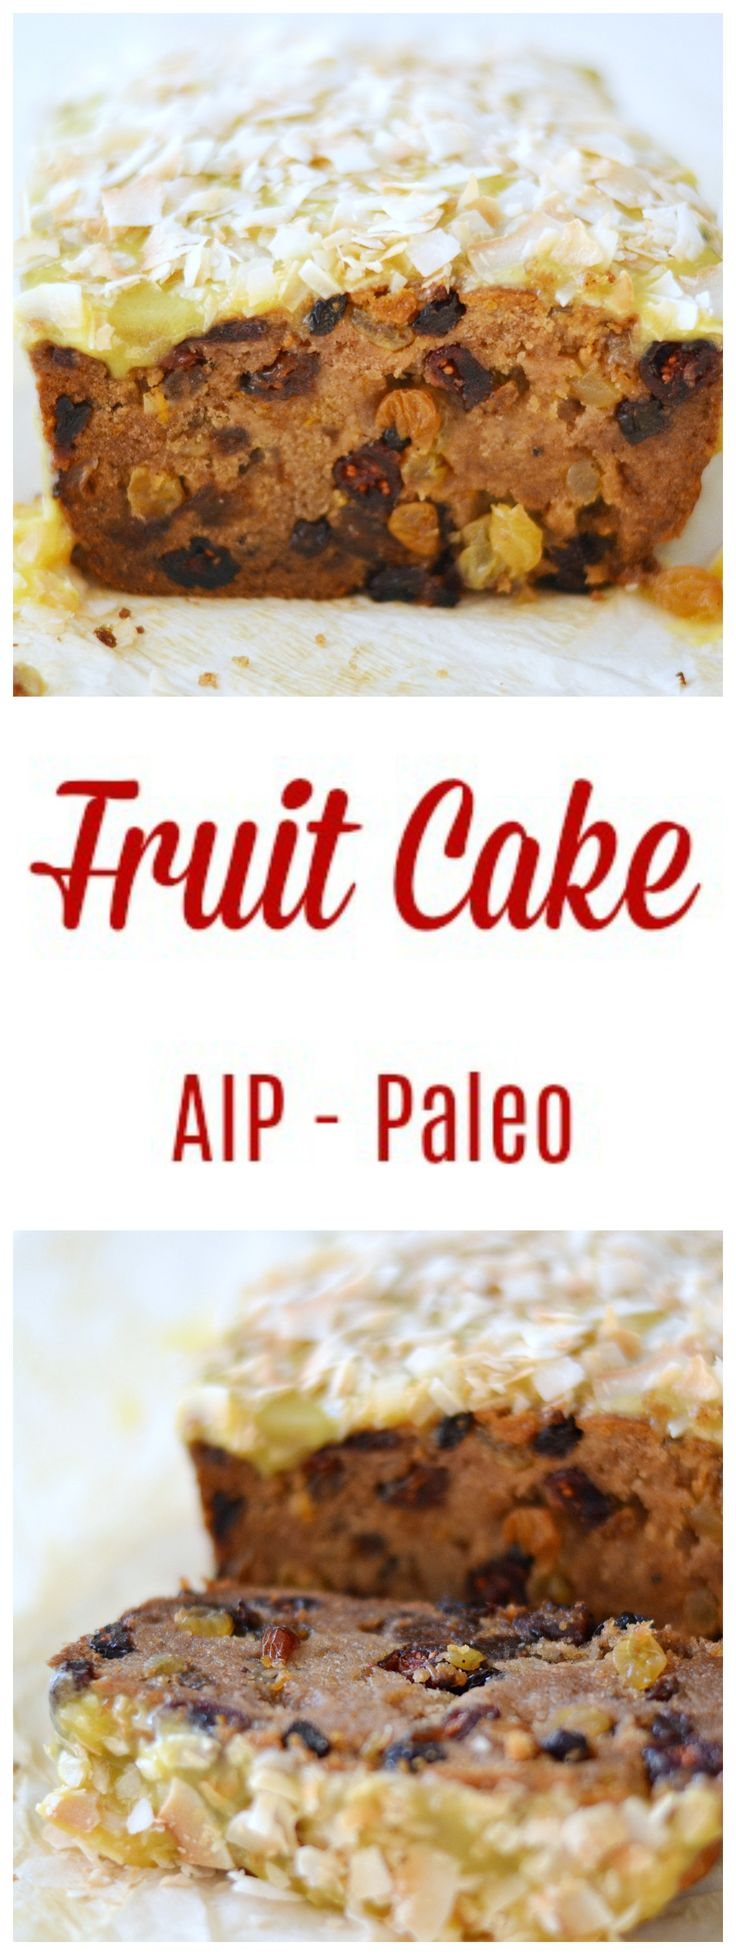 Fruit Cake (AIP/Paleo) | Lichen Paleo, Loving AIP